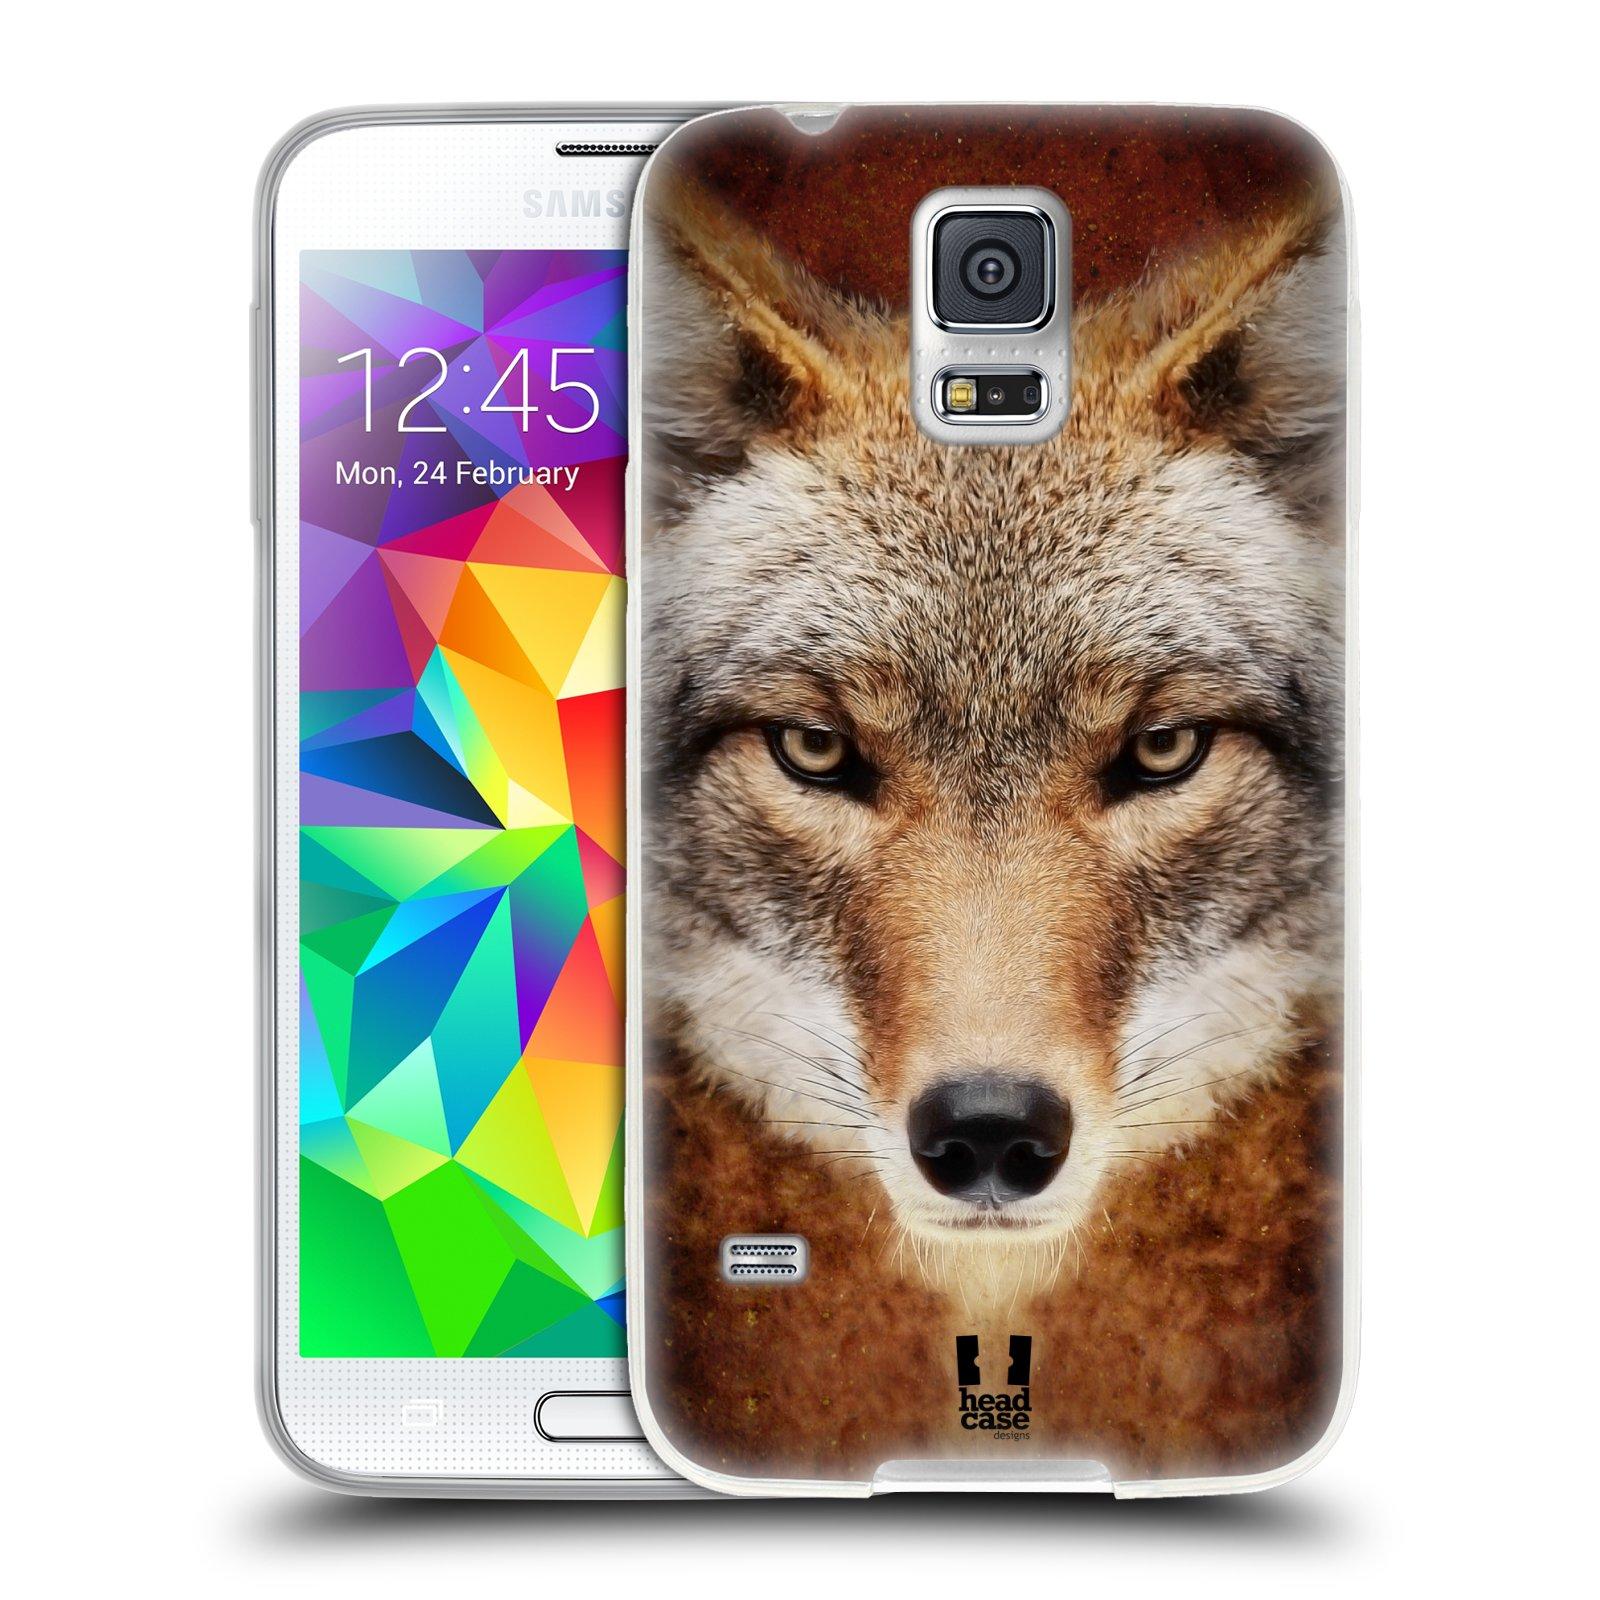 HEAD CASE silikonový obal na mobil Samsung Galaxy S5/S5 NEO vzor Zvířecí tváře kojot